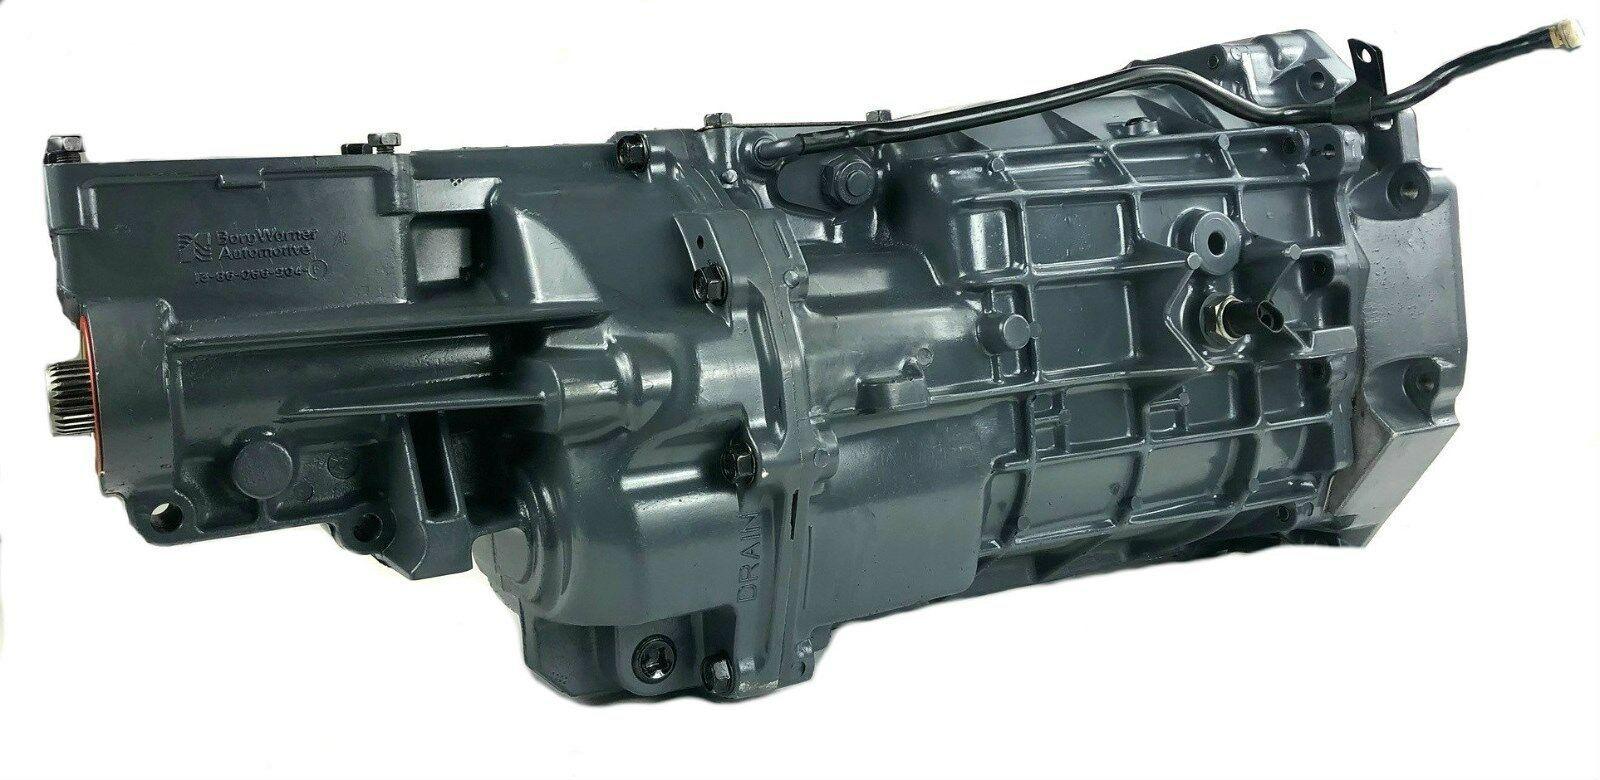 Camaro 6 Speed Transmission 6 Speed Transmission Camaro Transmission